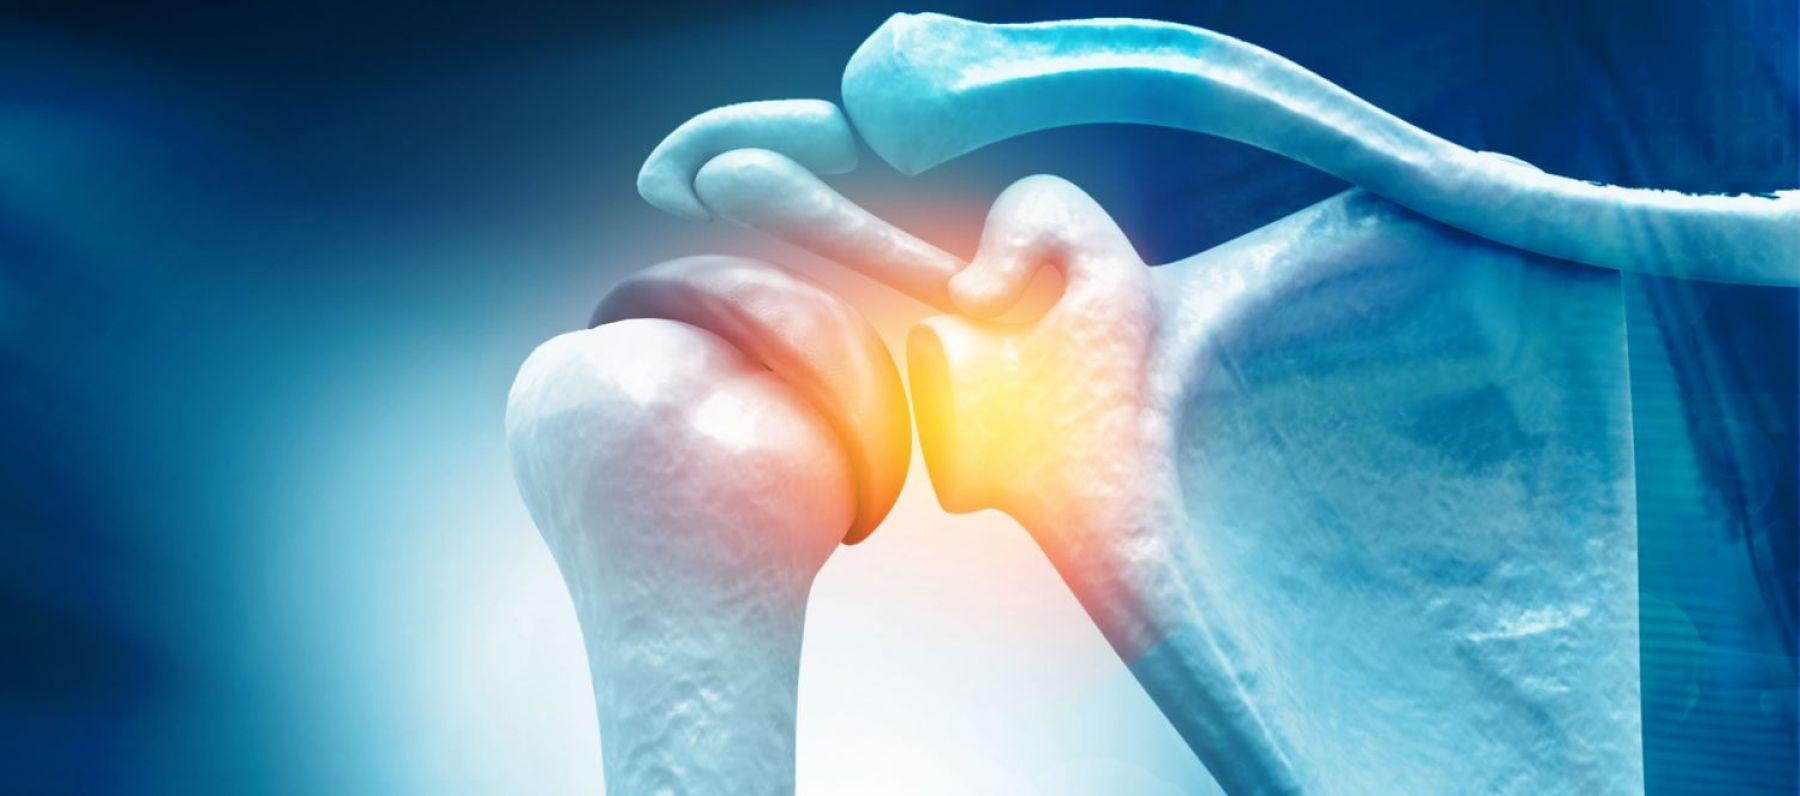 Co-design project for better bone health